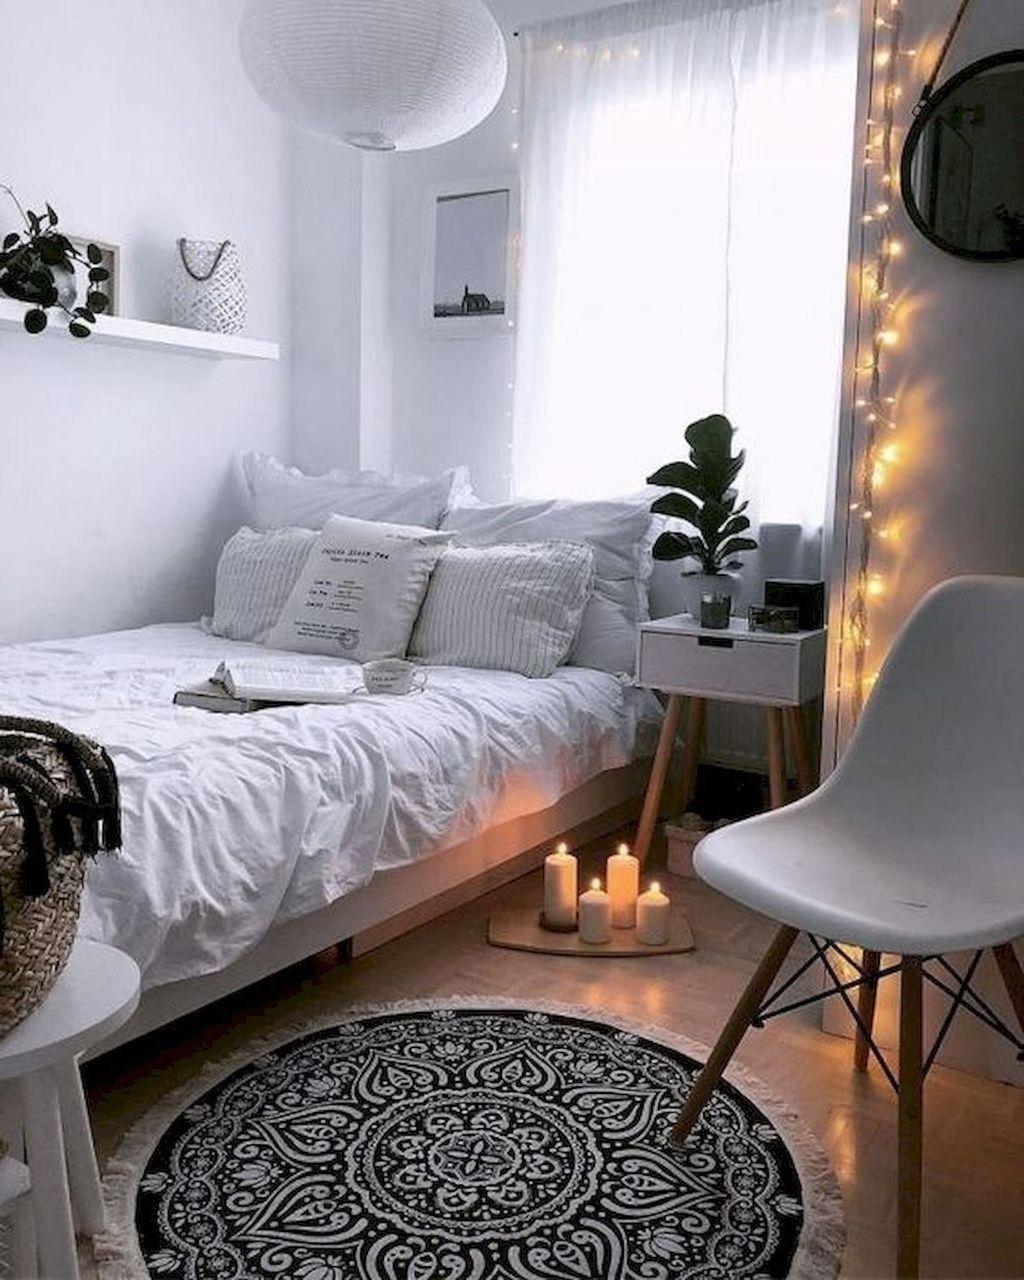 79 Gorgeous Apartment Decor Ideas Apartmentdecor Small Apartment Bedrooms College Bedroom Decor Simple Bedroom Small apartment bedroom decor